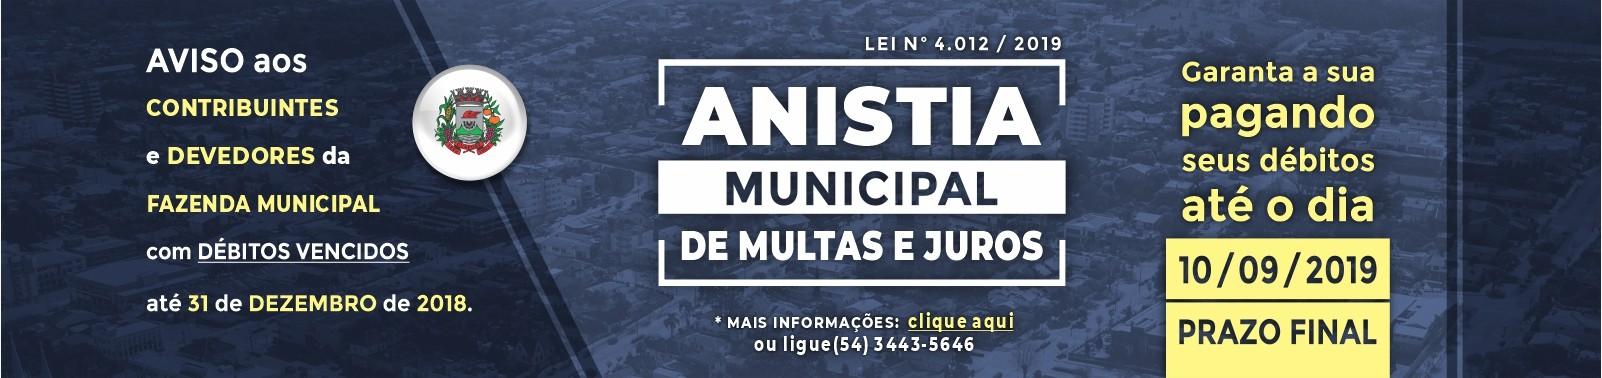 Banner 3 - Anistia Multas e Juros